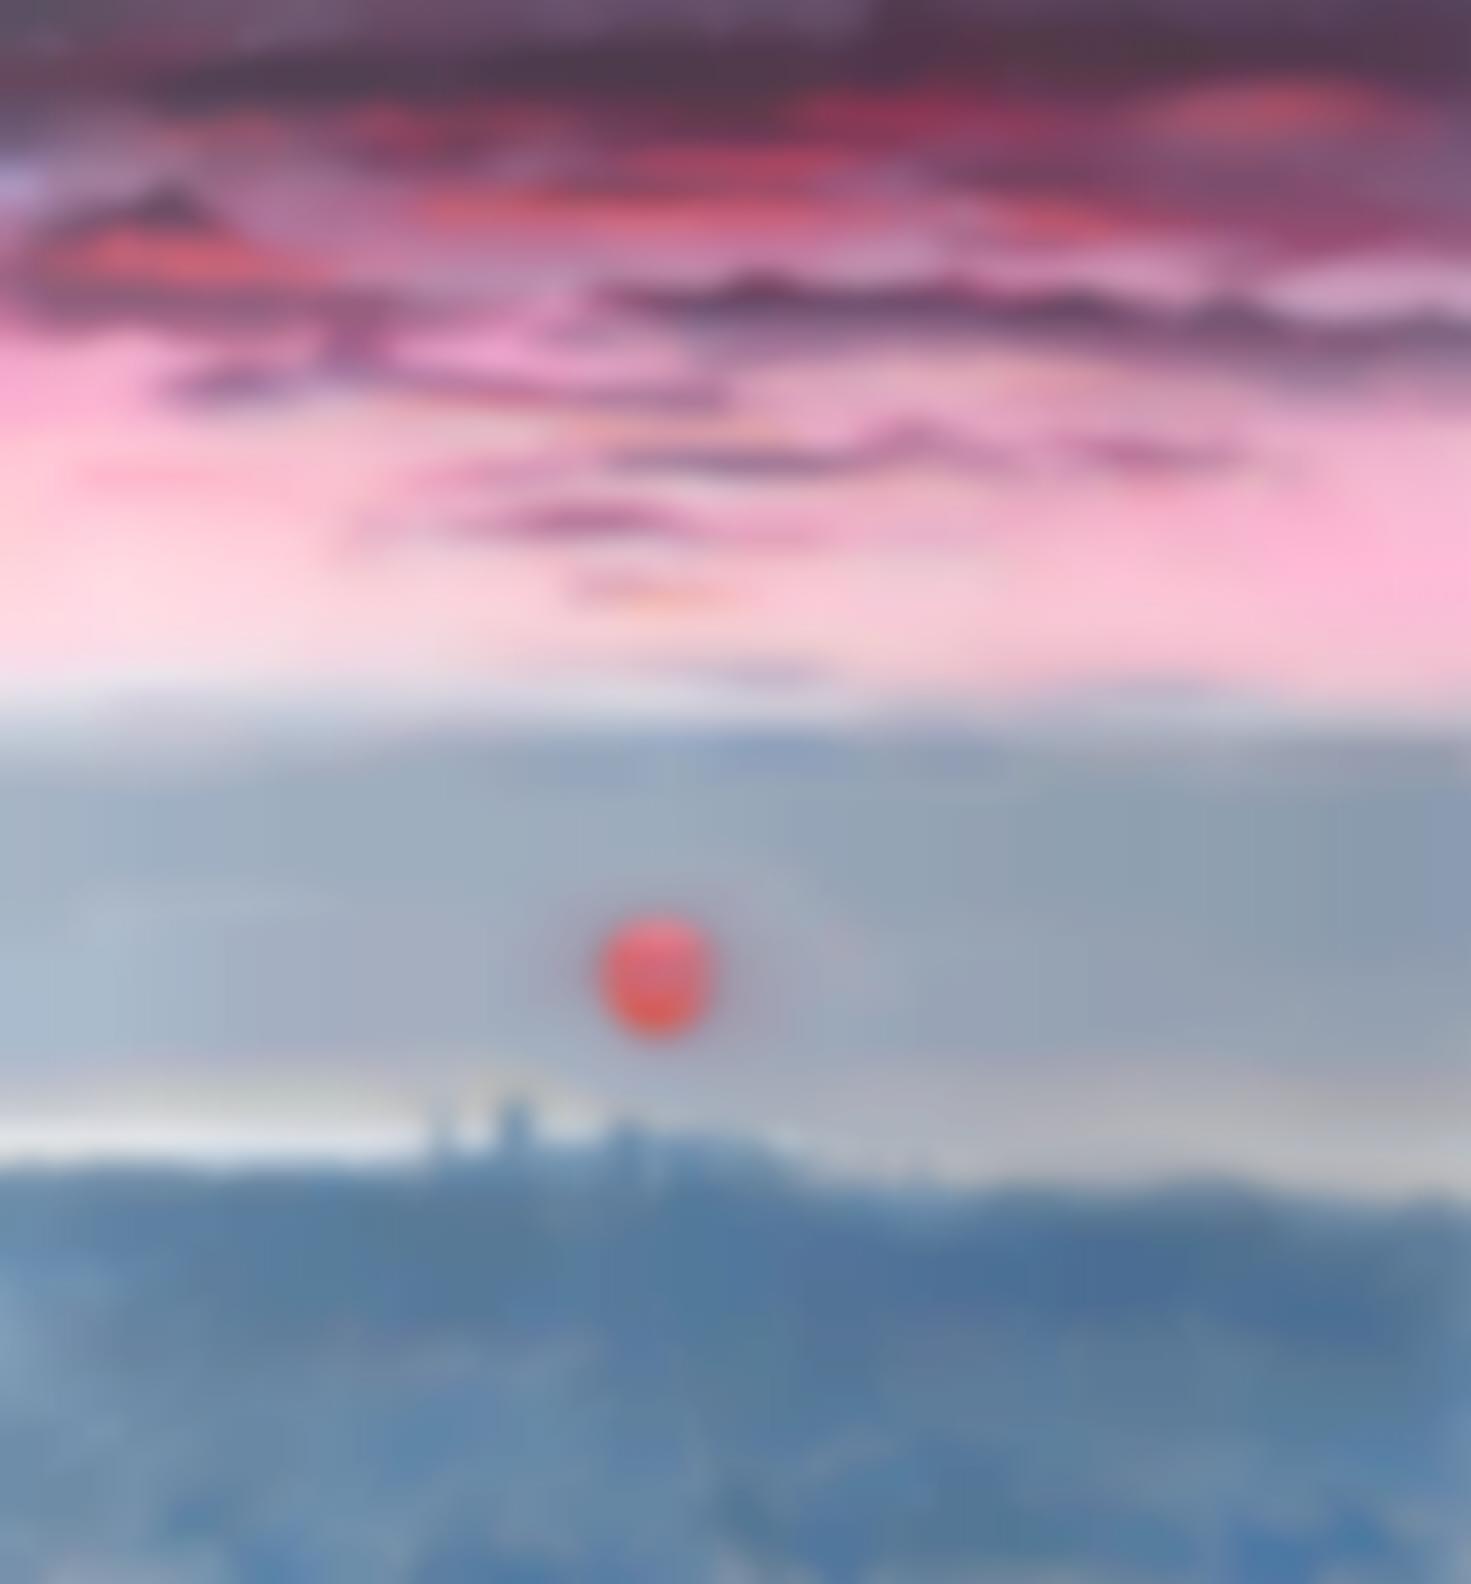 Paul Wonner-Twenty-Seven Studies For Romantic Views Of San Francisco: #14 Dawn With Red Sun Behind Fog-1980